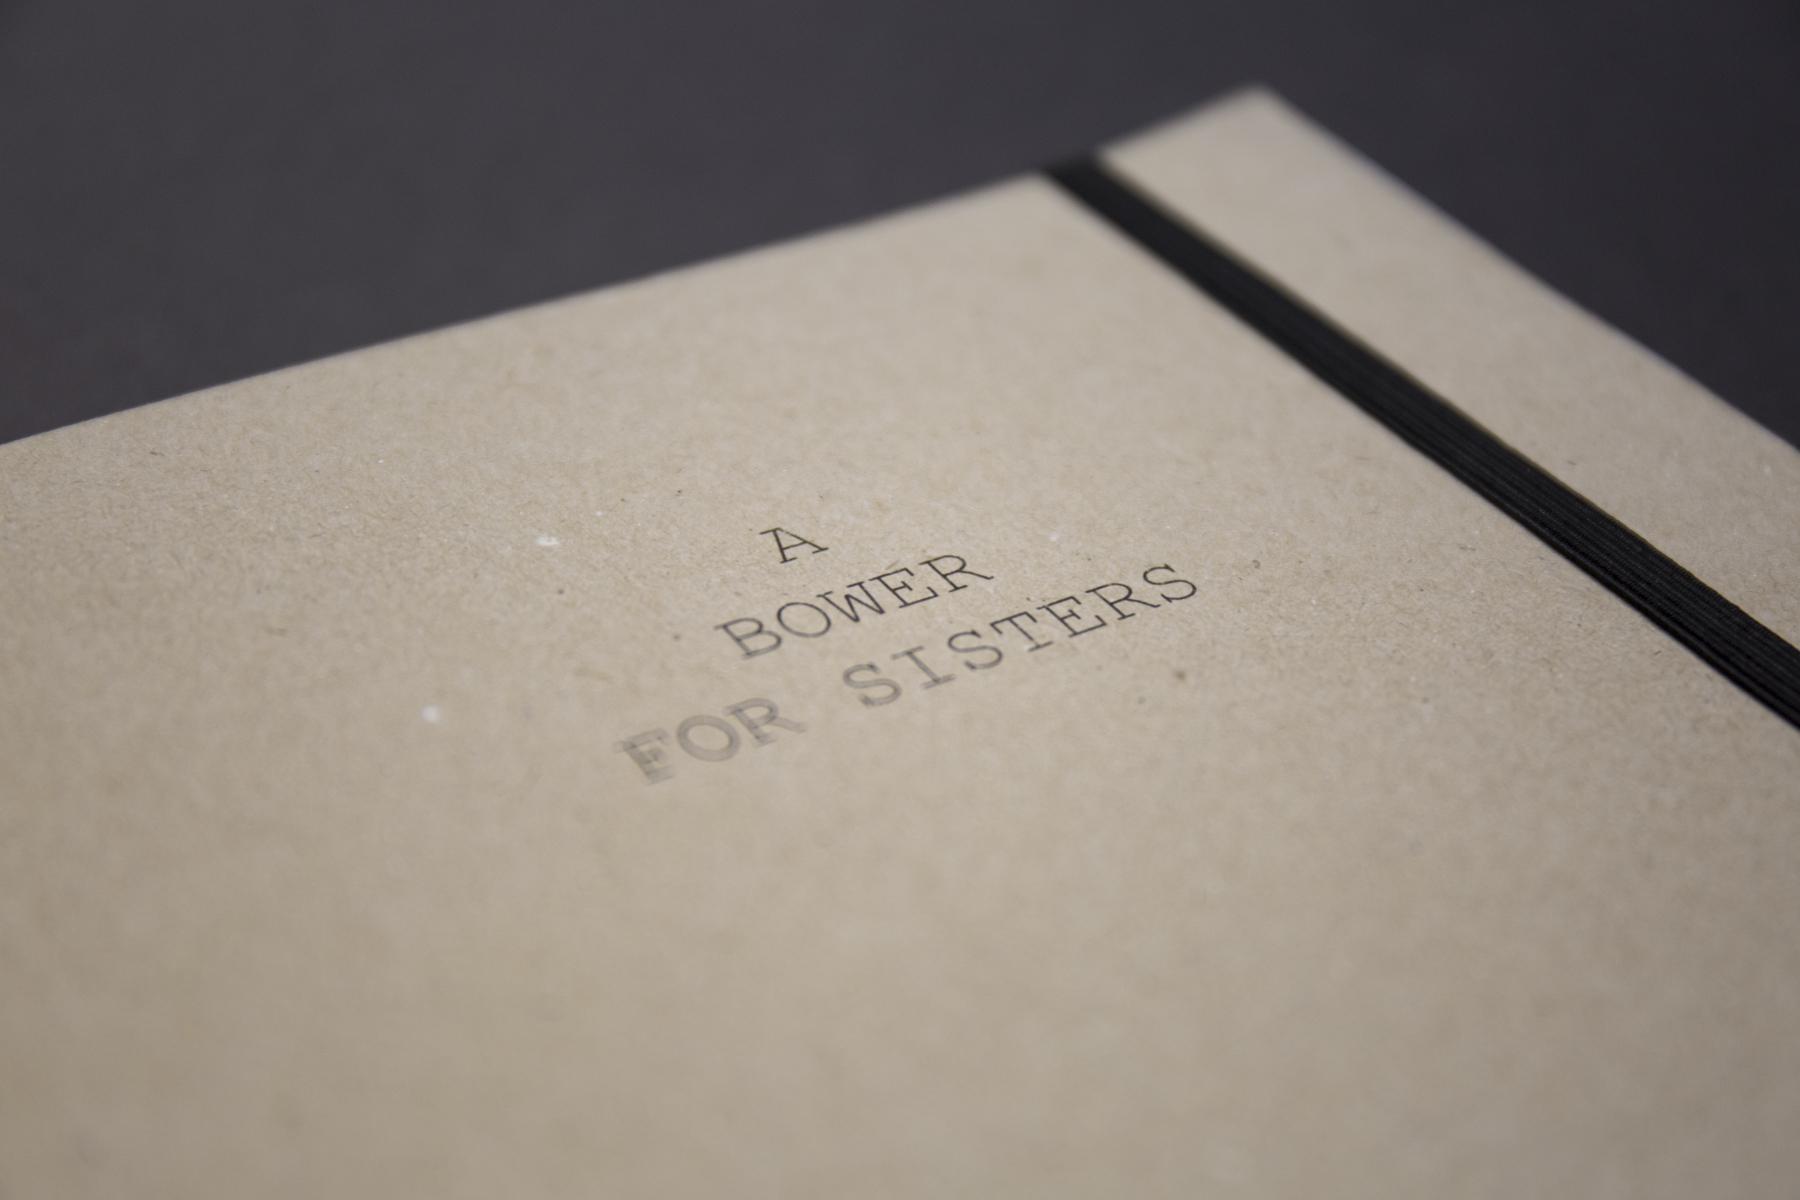 abowerforsisters-book-4.jpg